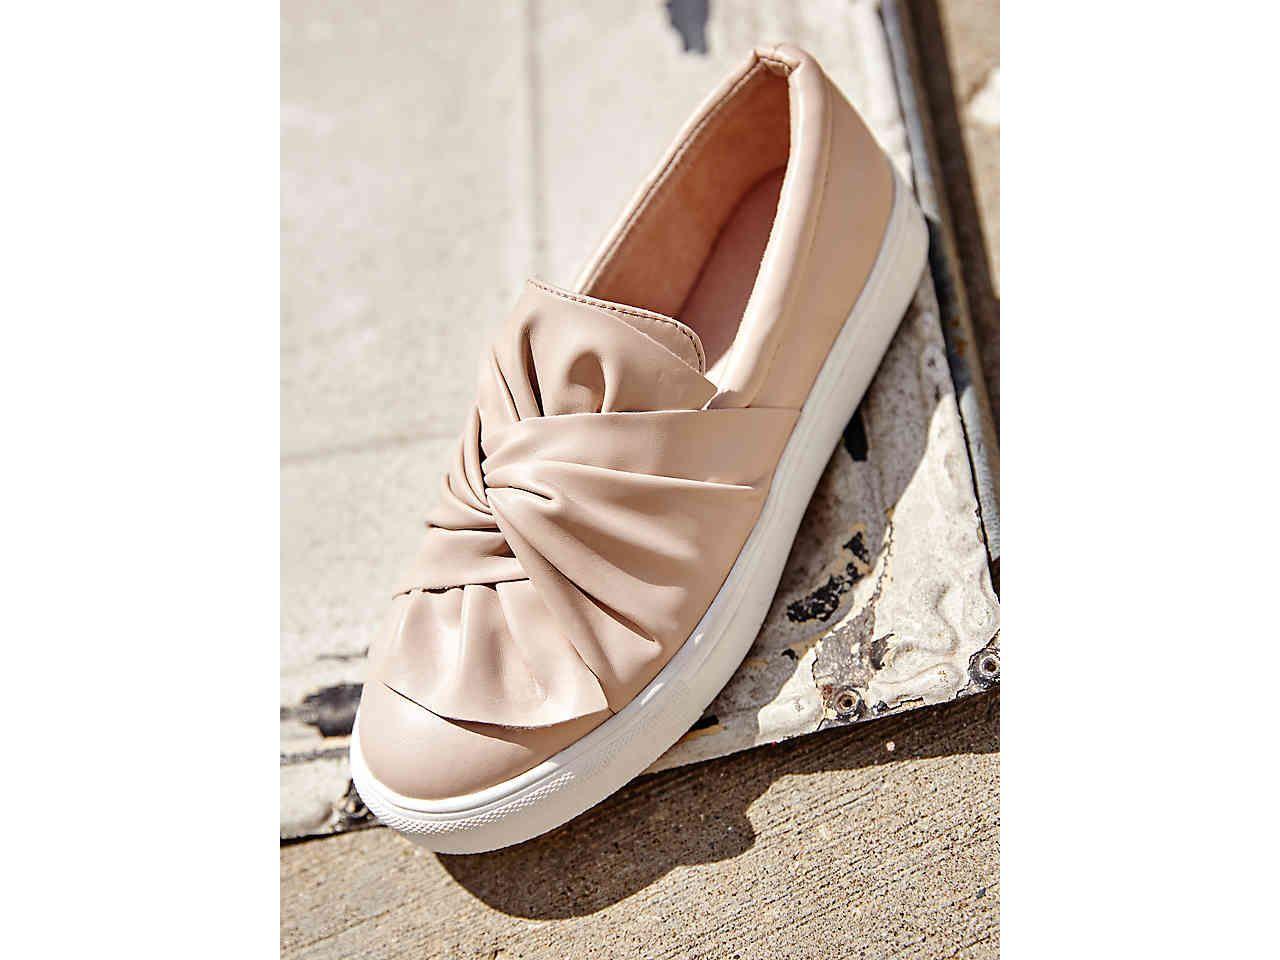 Mia Bow Zoe Fashion Slip On SneakerZapatos ShoesSneakers IH2YWE9D